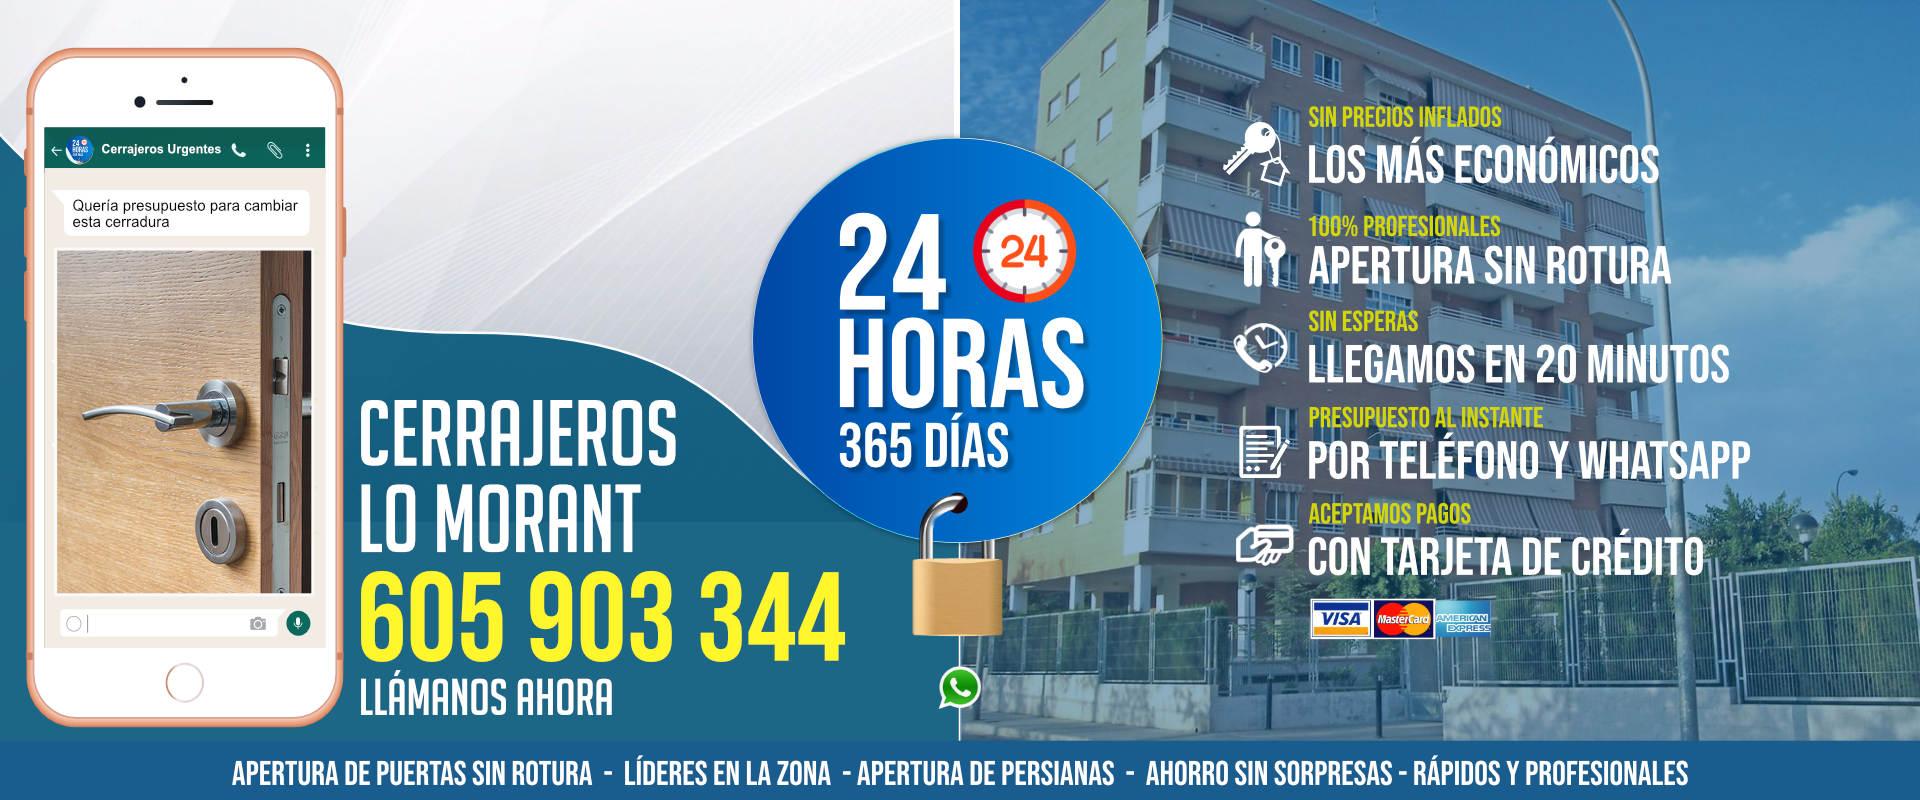 Cerrajeros Lo Morant 1